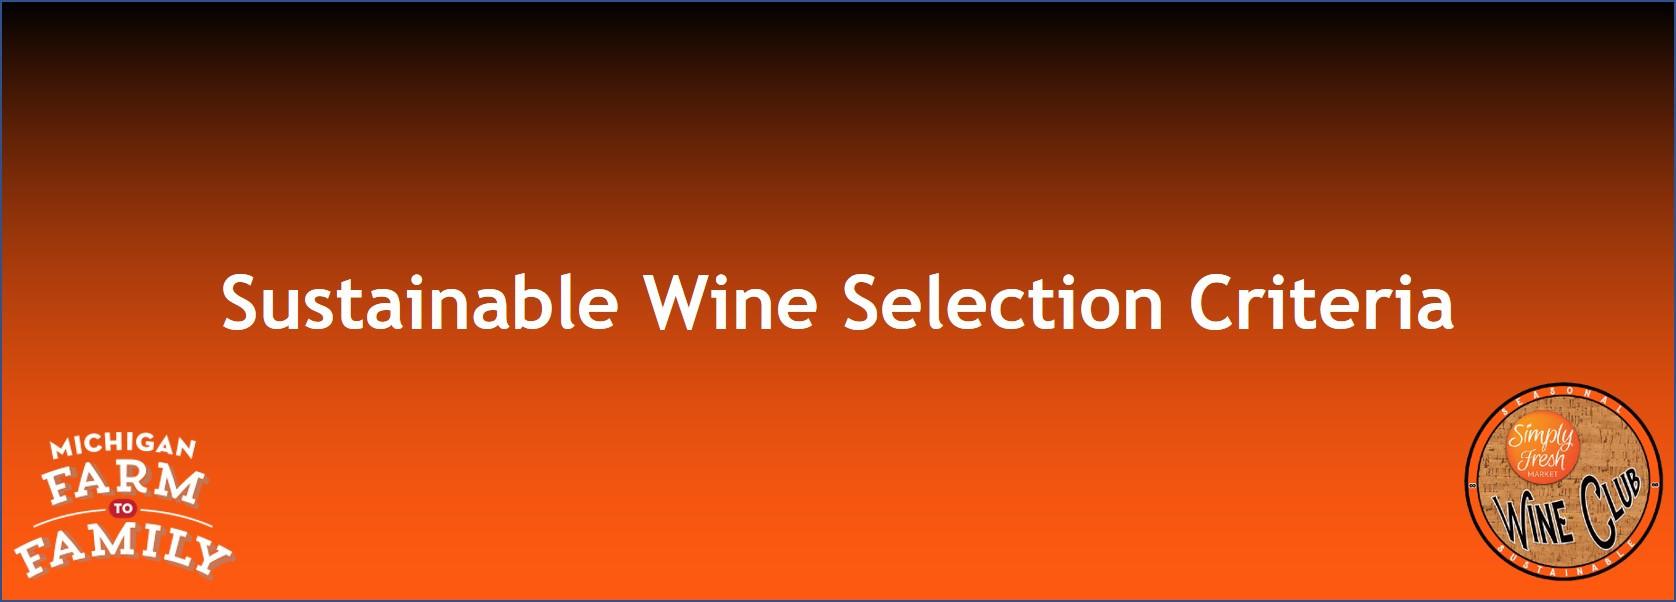 wine-FAQ-page-header.jpg